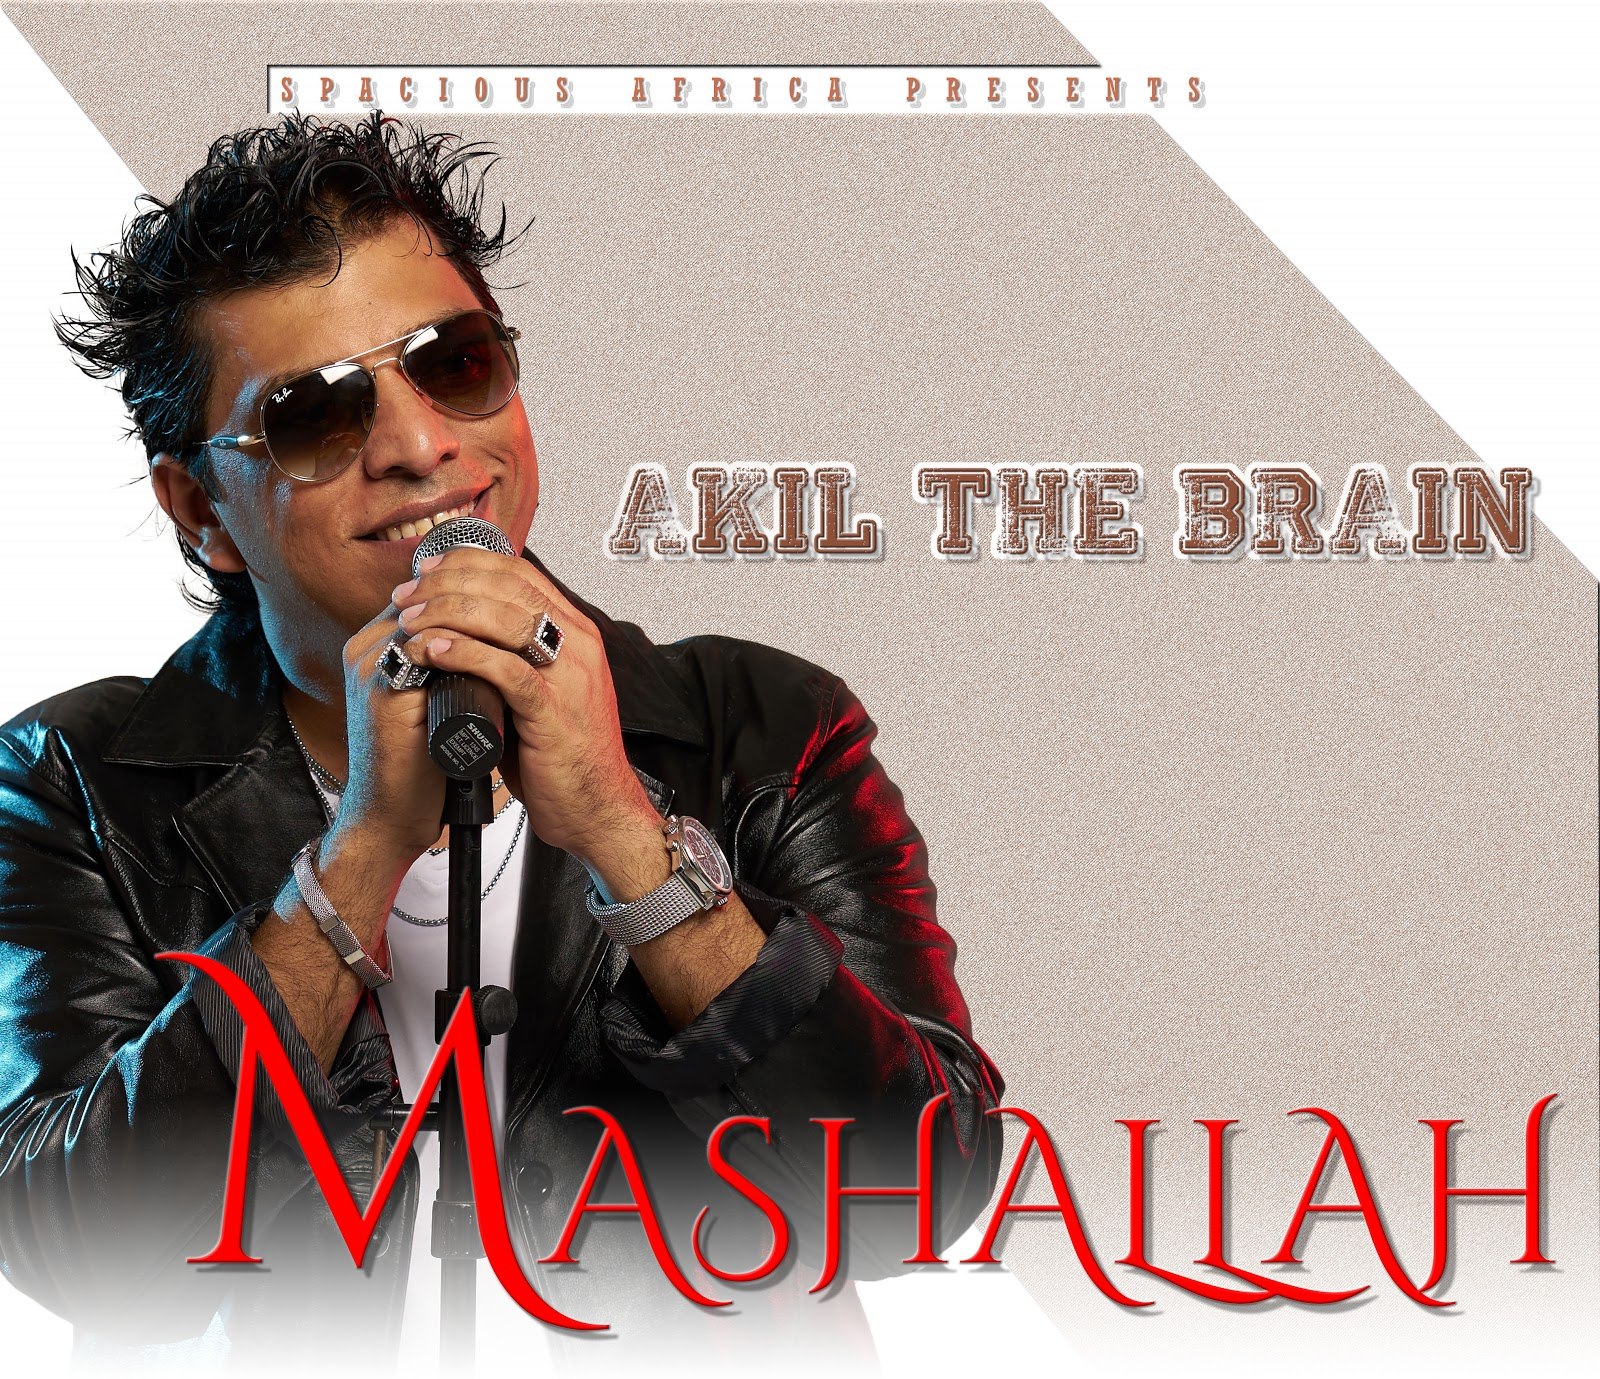 Mashallah subhanallah tera chehra mp3 download.